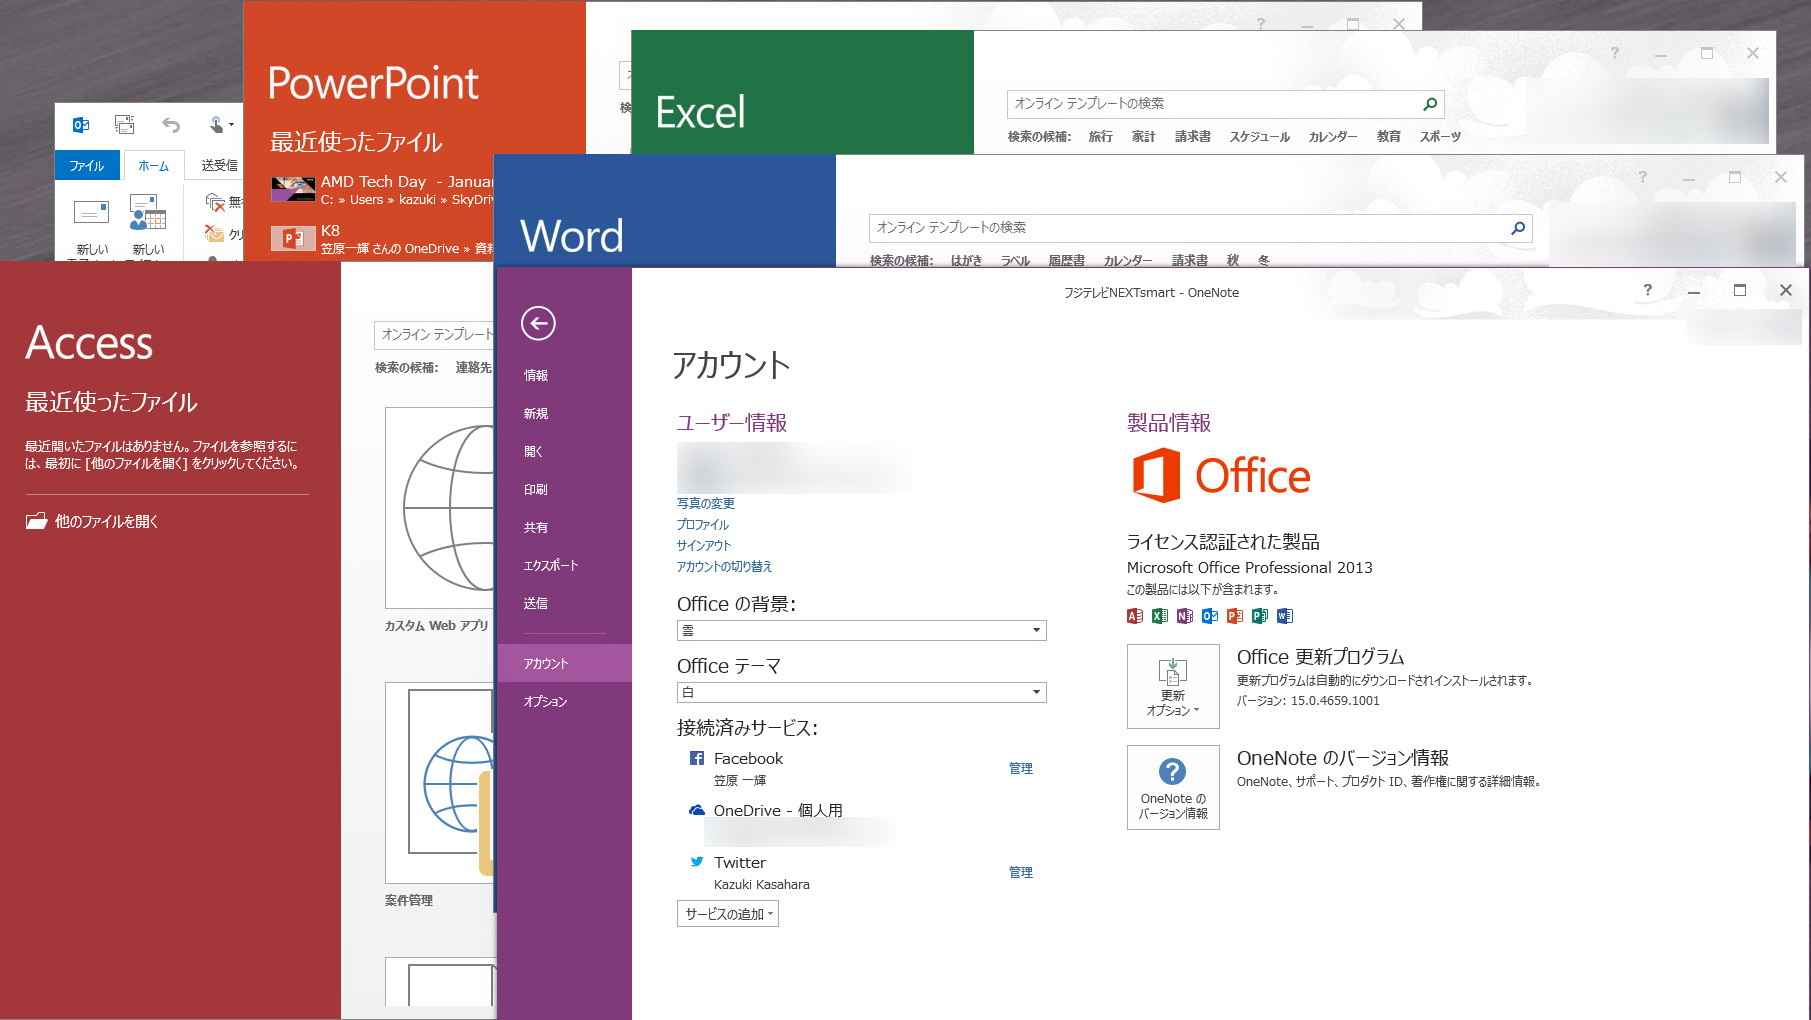 MicrosoftのOffice 2013